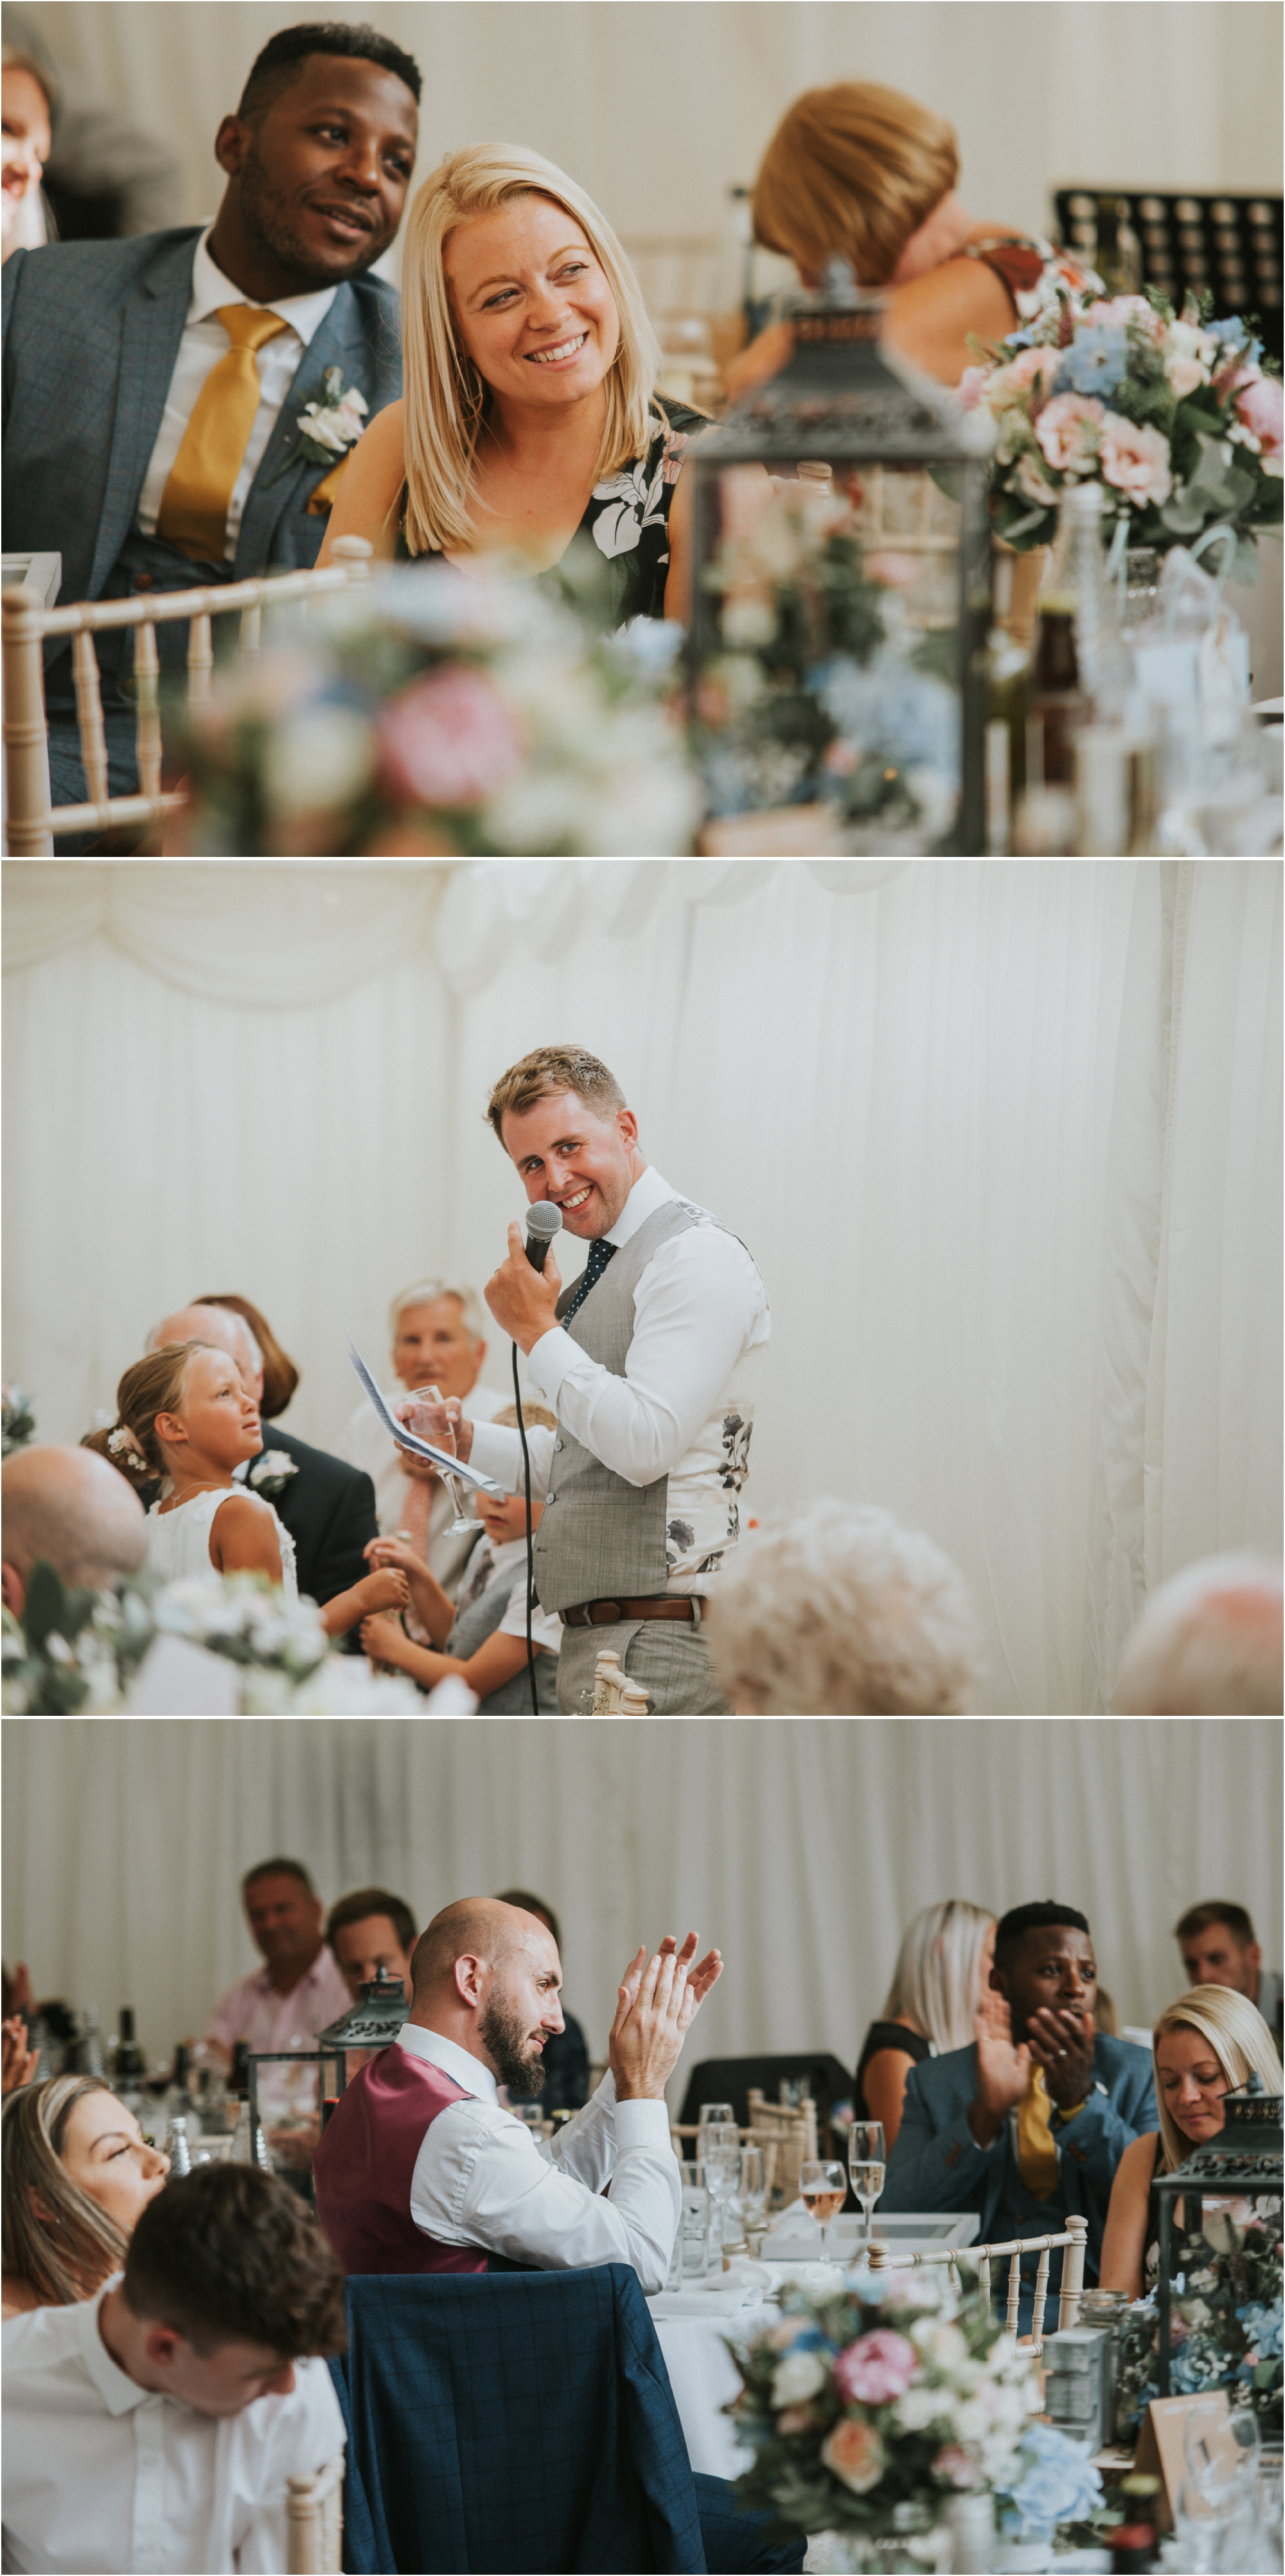 PheasantBrewery-LukeHolroyd-Yorkshirewedding_000178.jpg